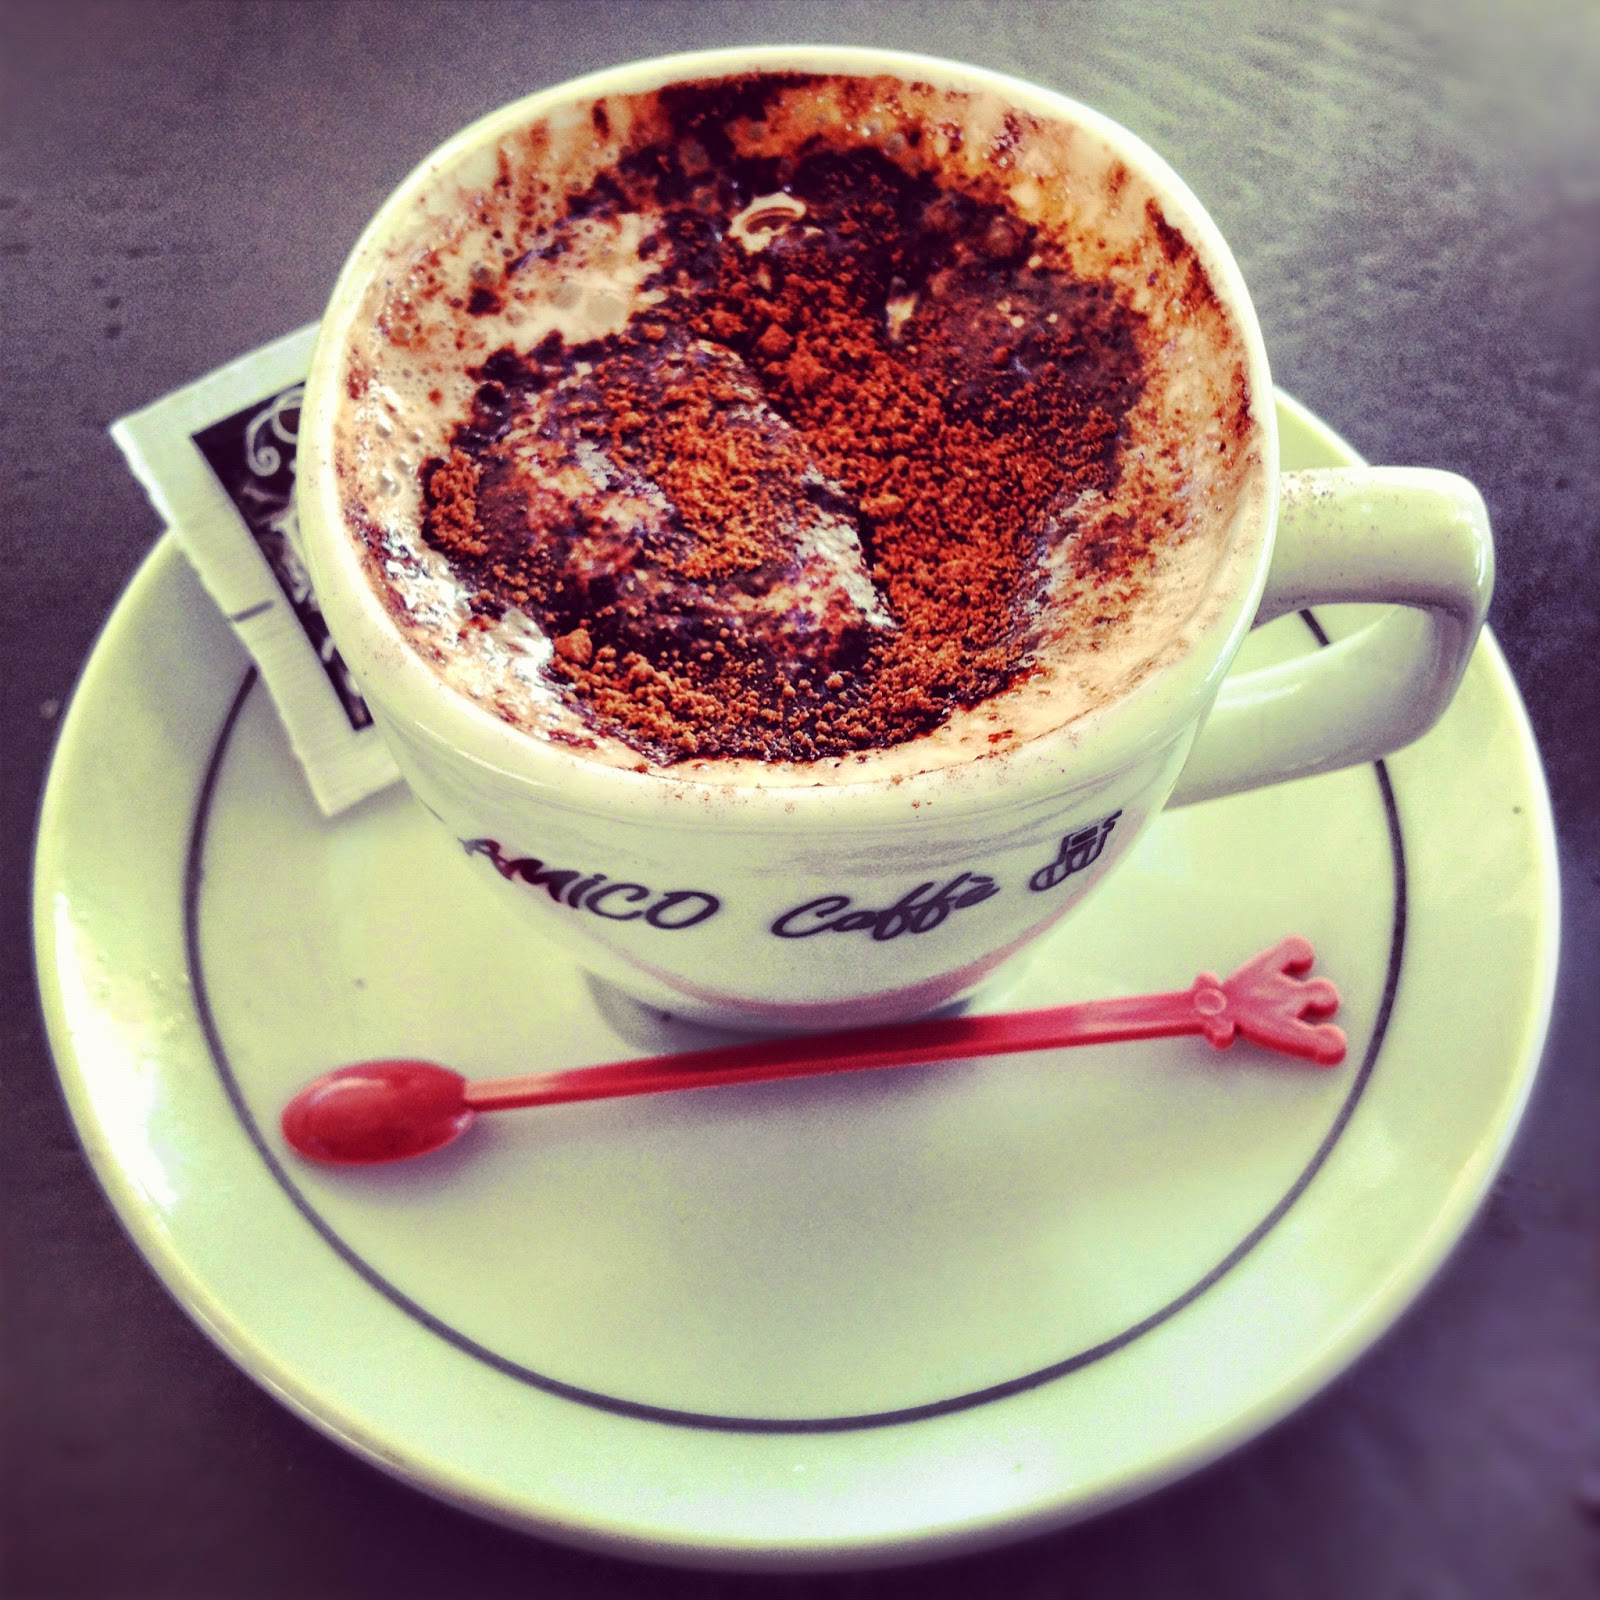 Kaffee, Kuchen, lebensrettend, Freunde, Coffee, cake, lifesaving, friends